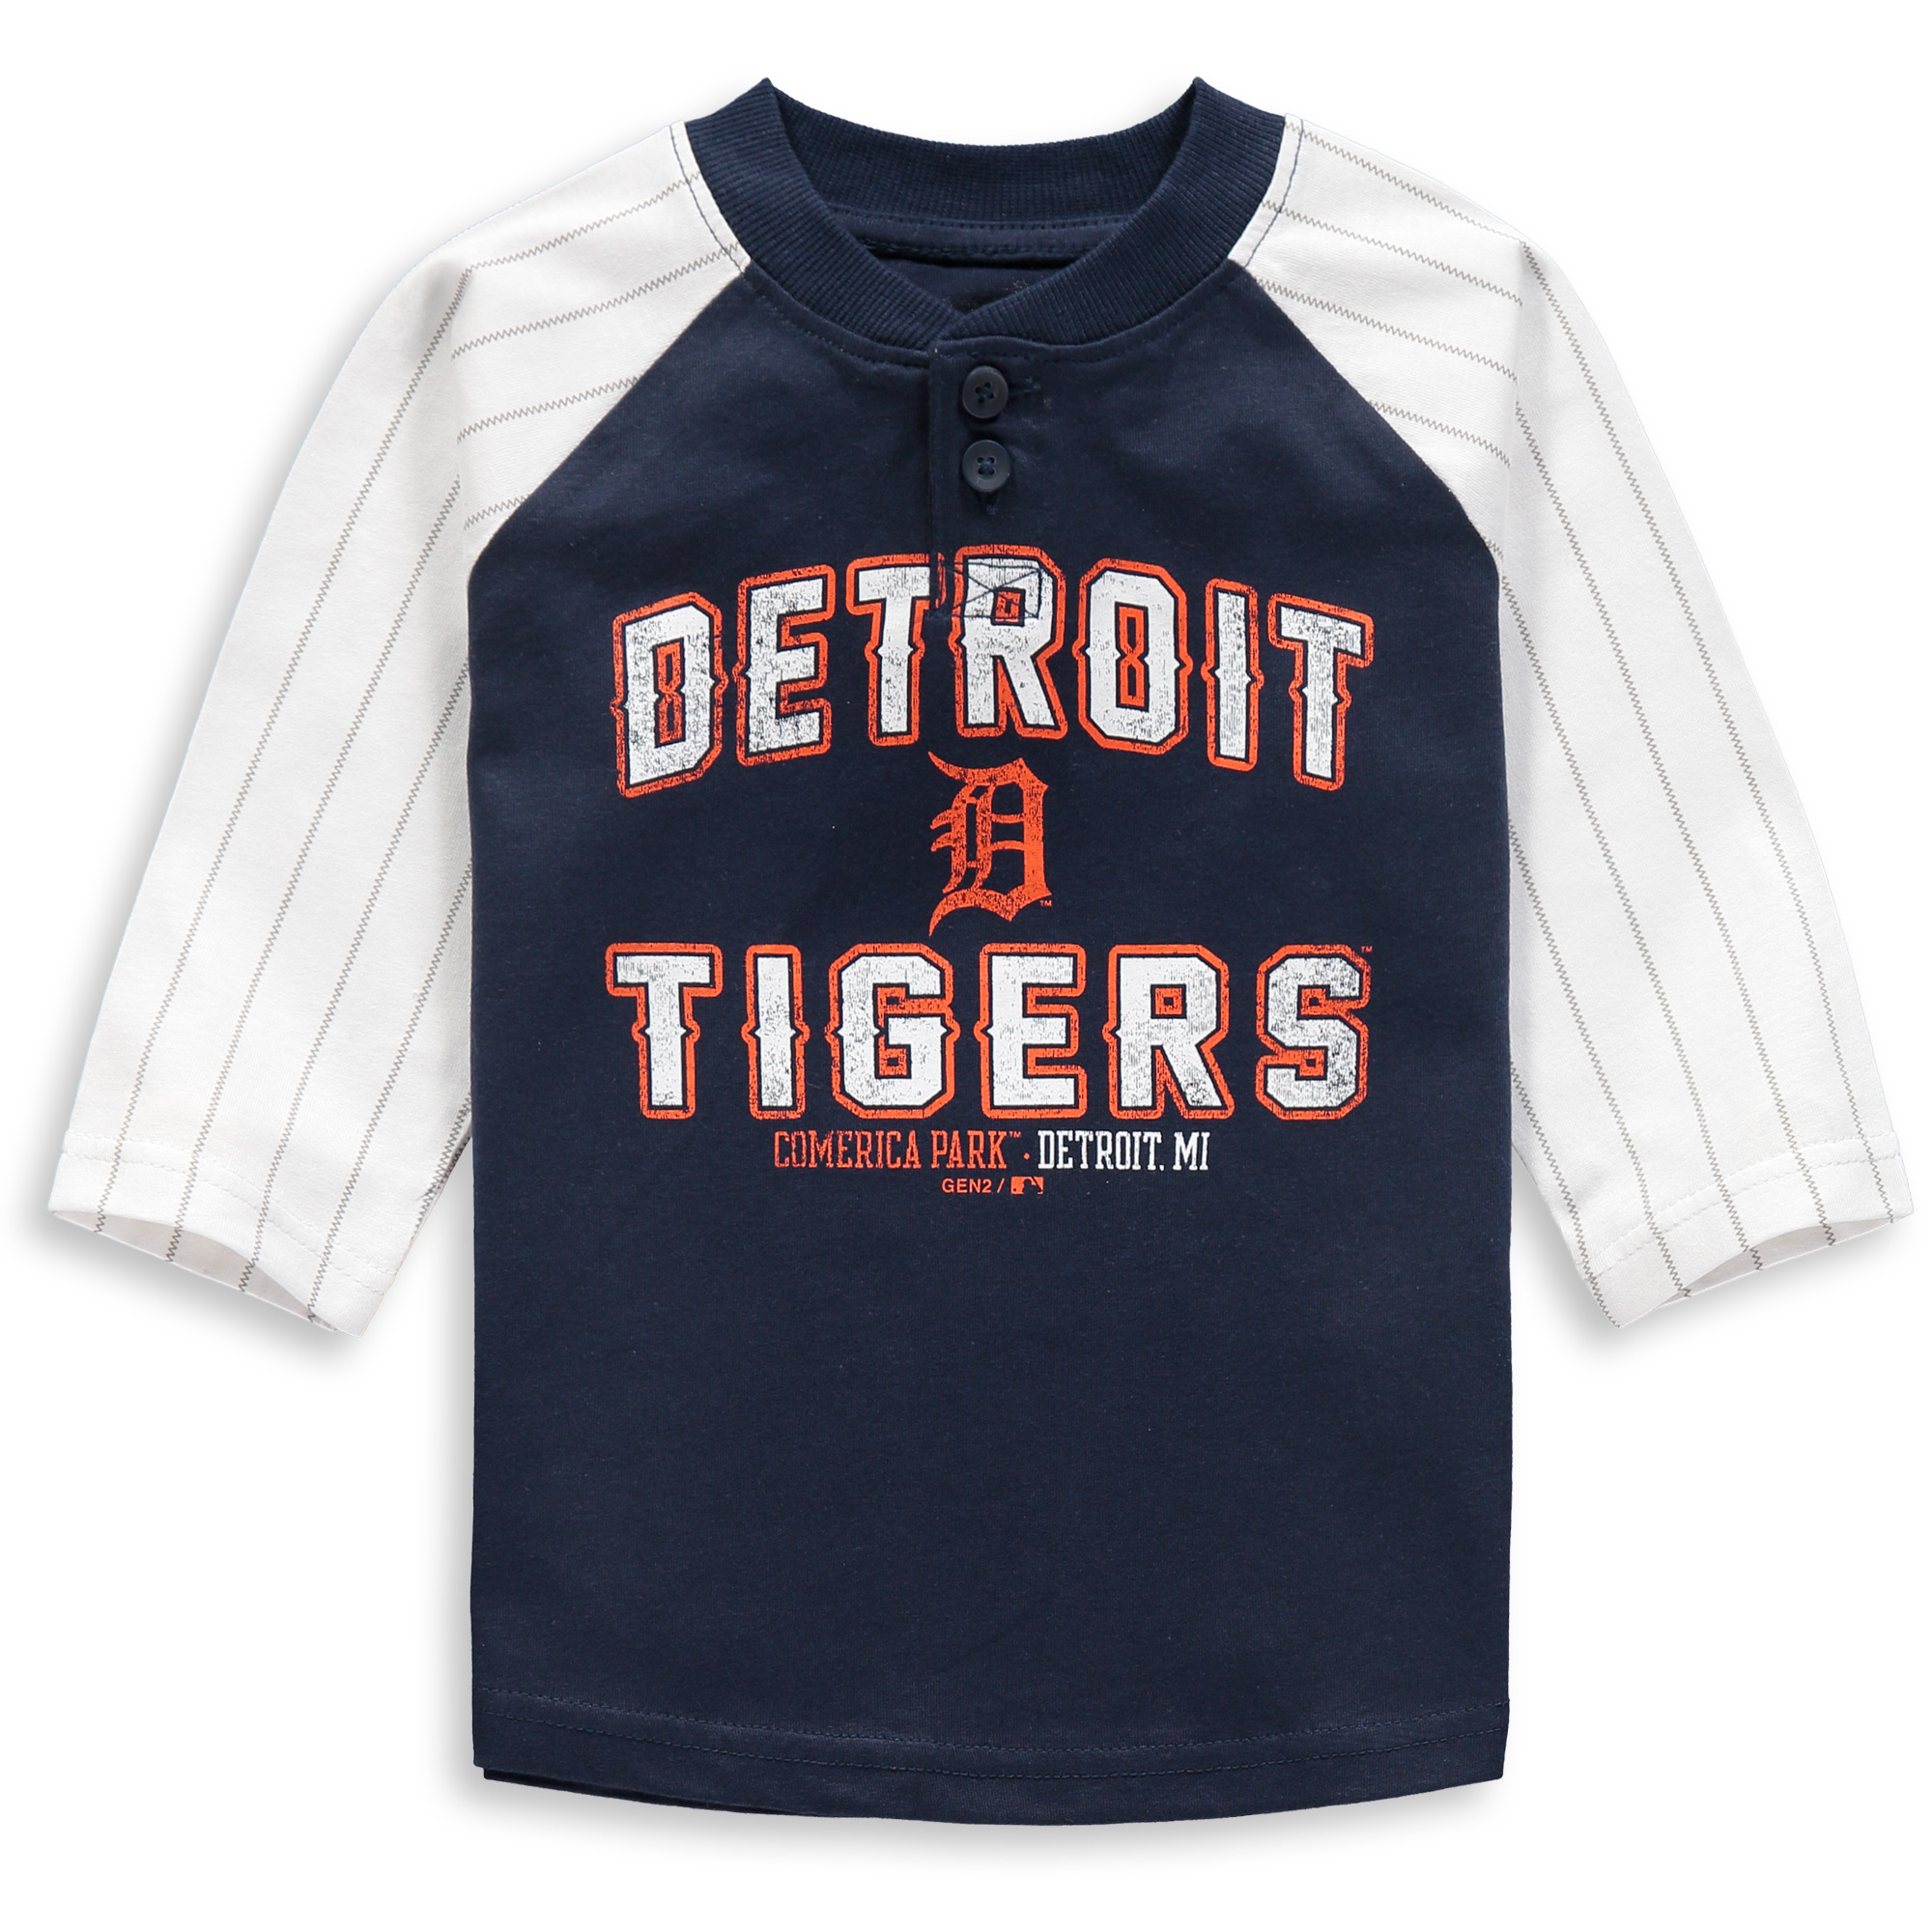 Detroit Tigers Toddler The Original 3/4-Sleeve T-Shirt - Navy